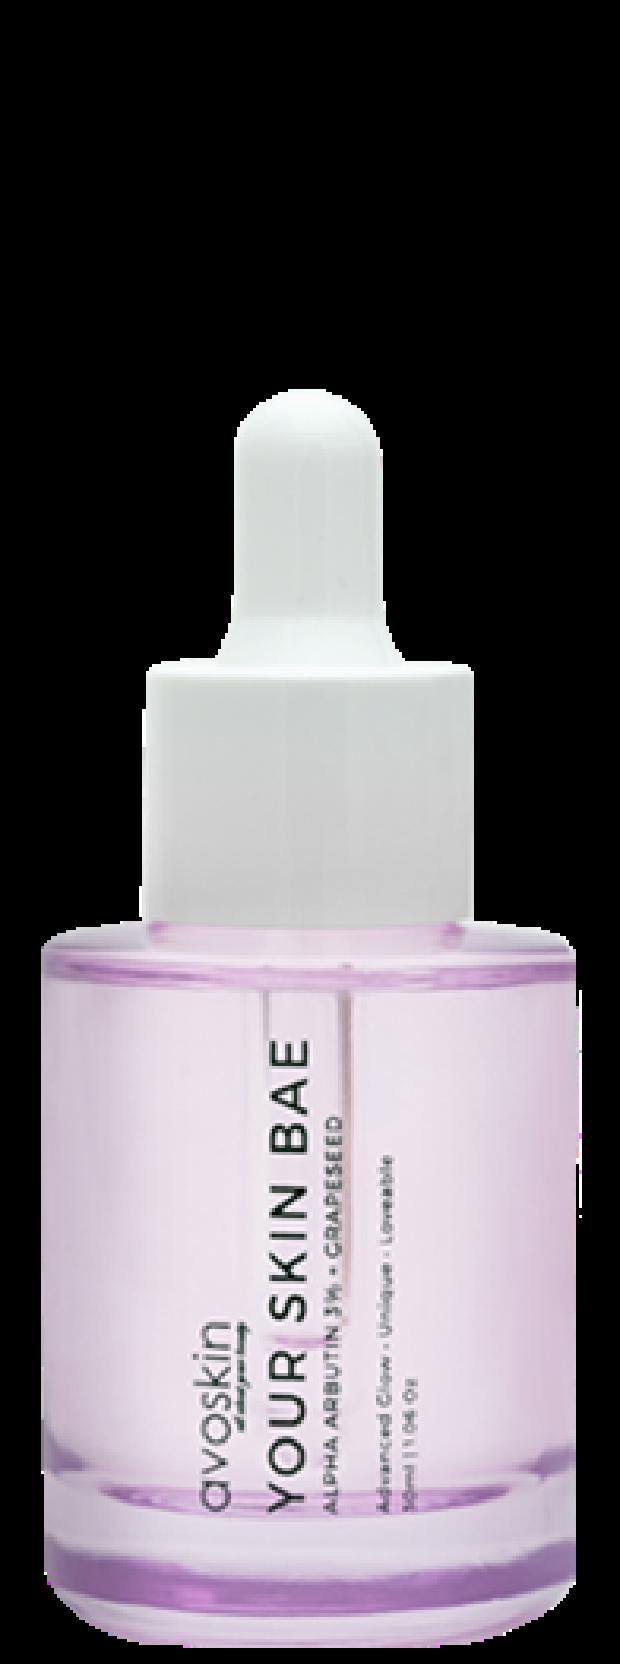 Avoskin Your Skin Bae Alpha Arbutin 3% + Grapeesed Serum/avoskinbeauty.com